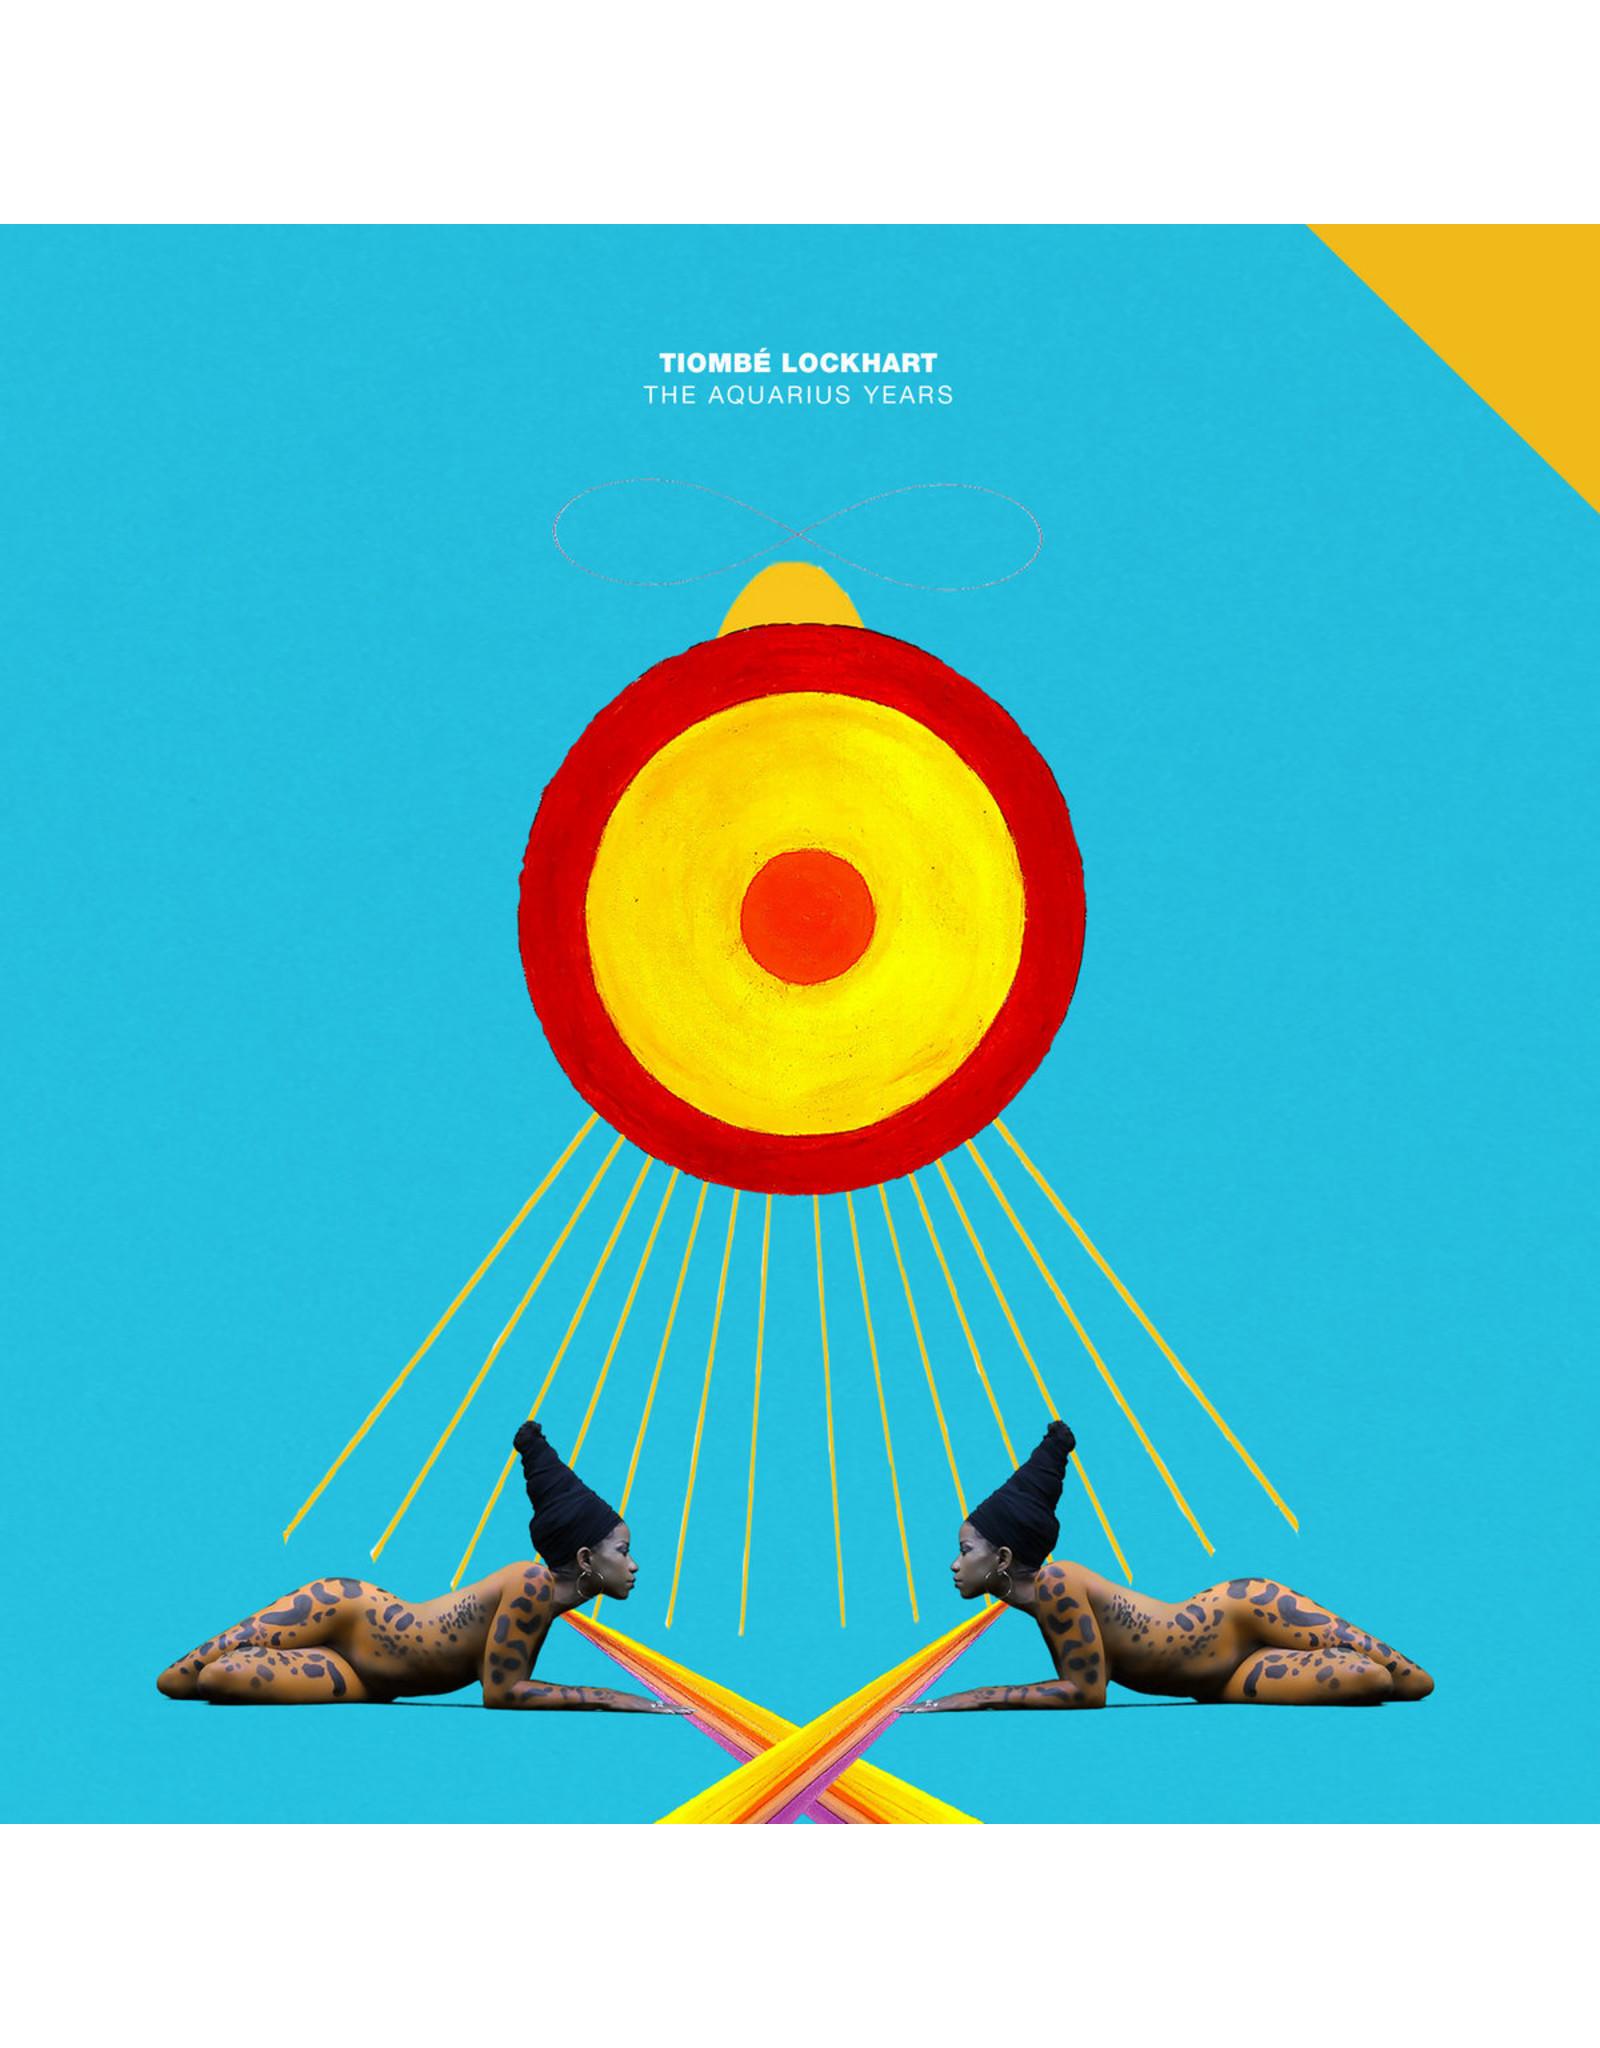 New Vinyl Tiombé Lockhart - The Aquarius Years LP